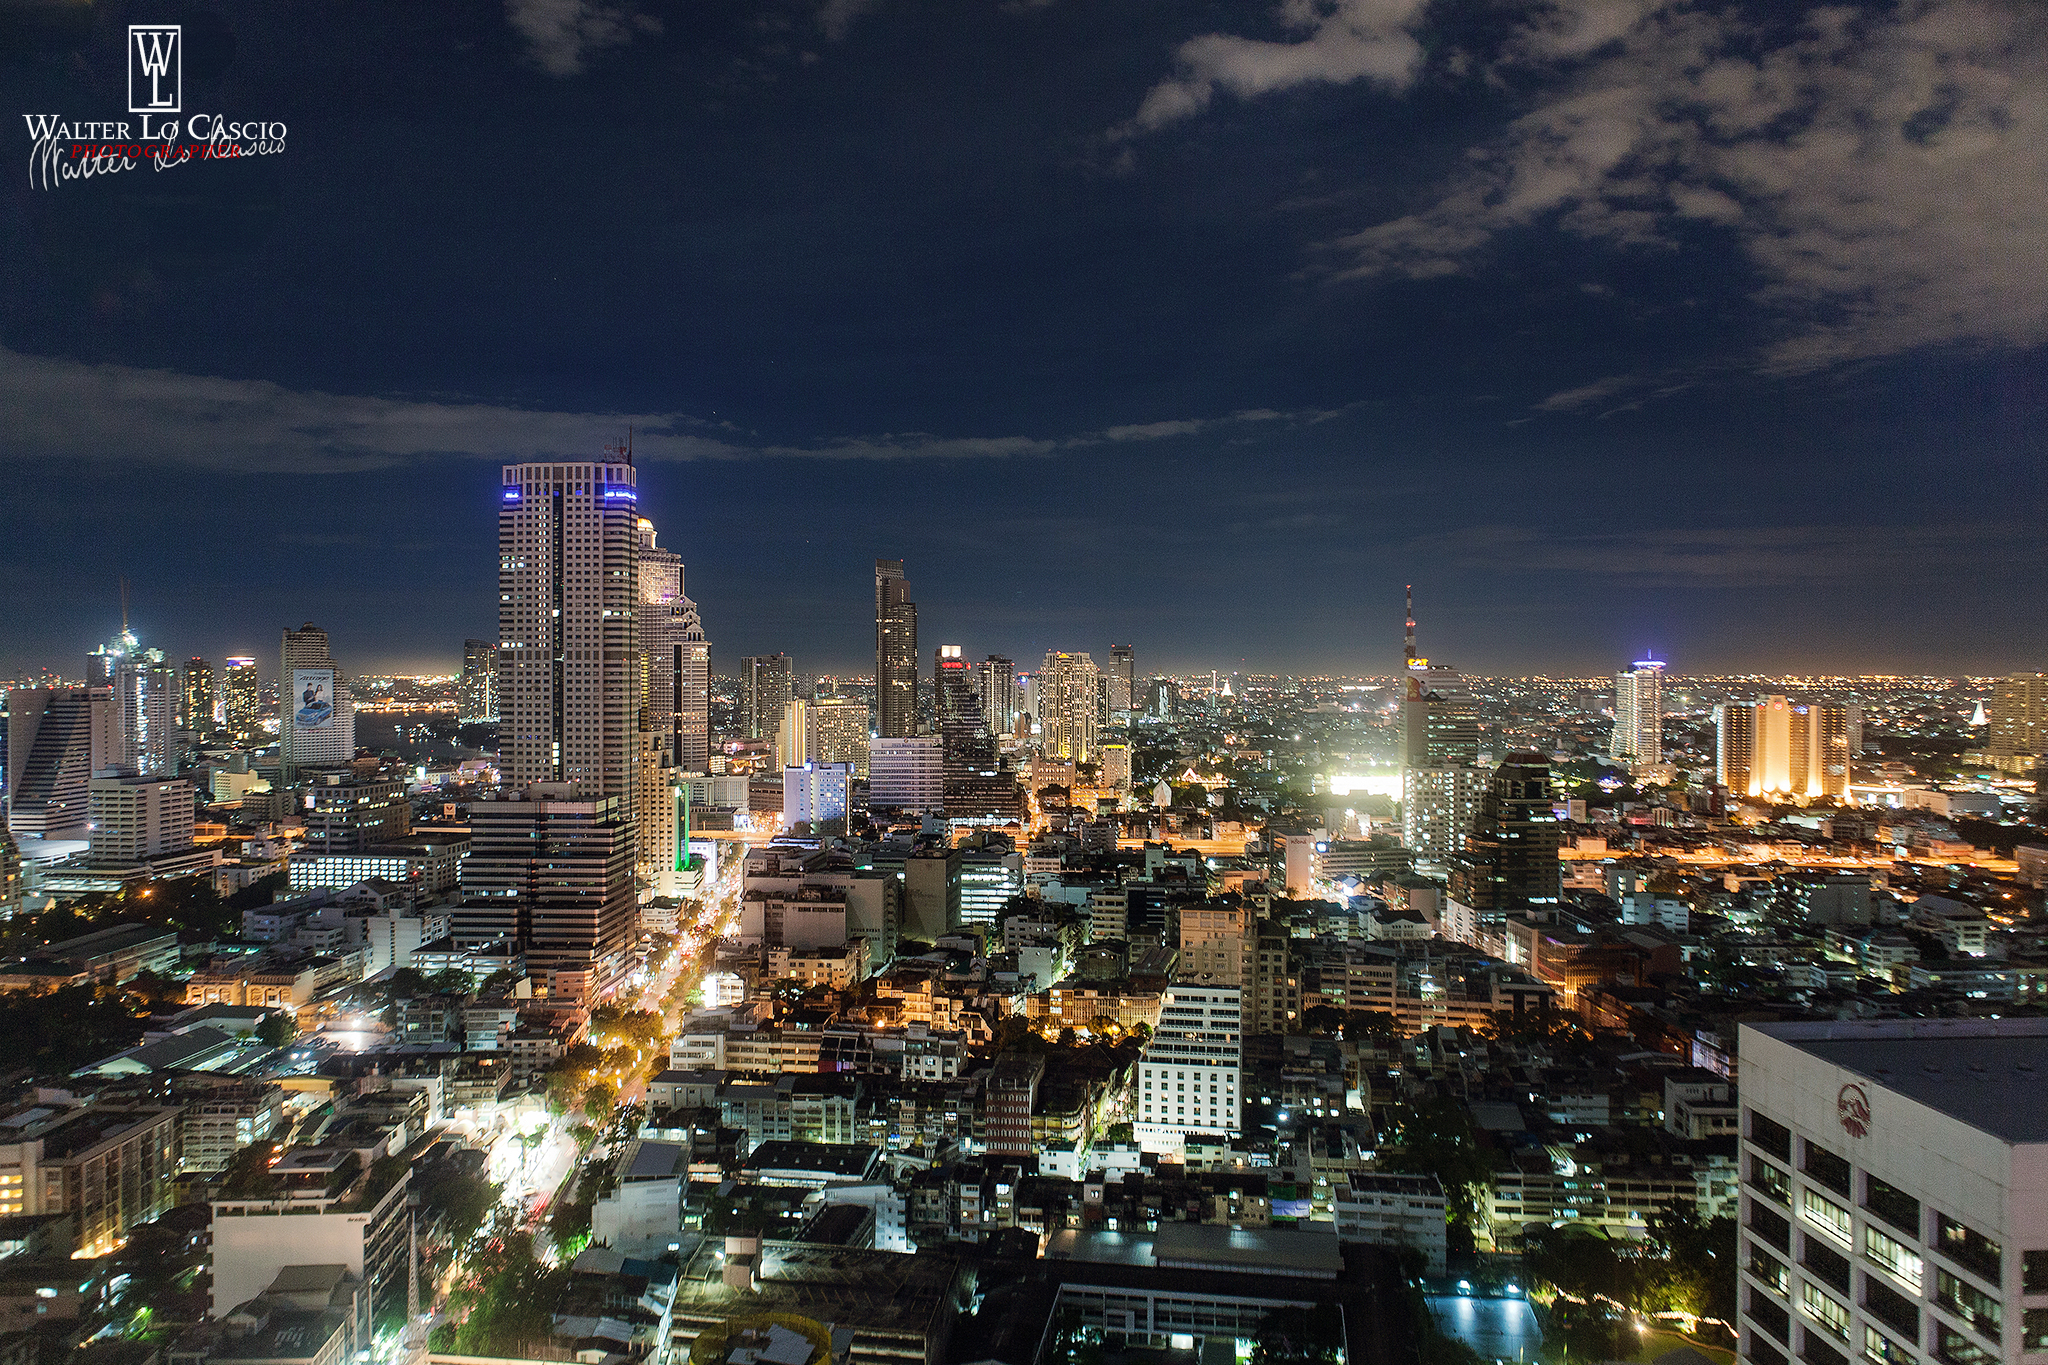 thailandia-2014_25425954760_o.jpg